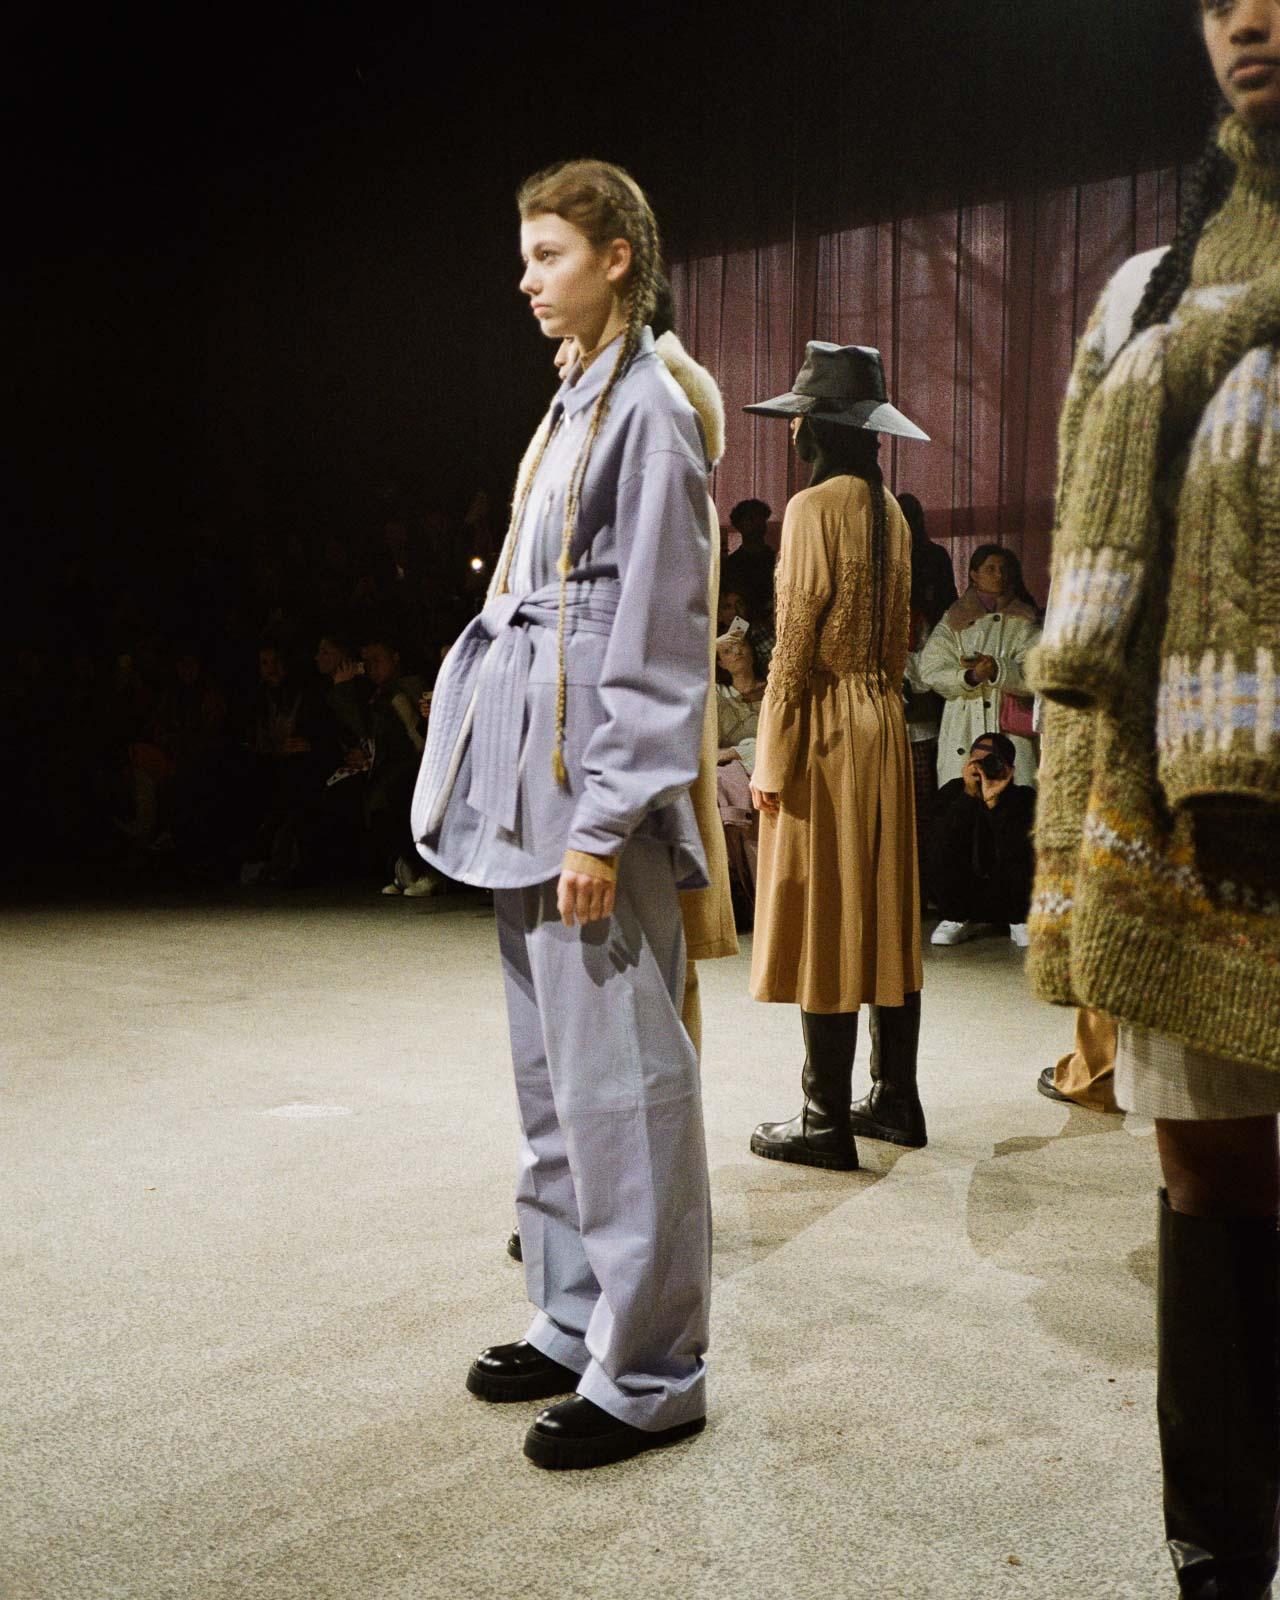 Copenhagen Fashion Week Holzweiler AW 2020 show